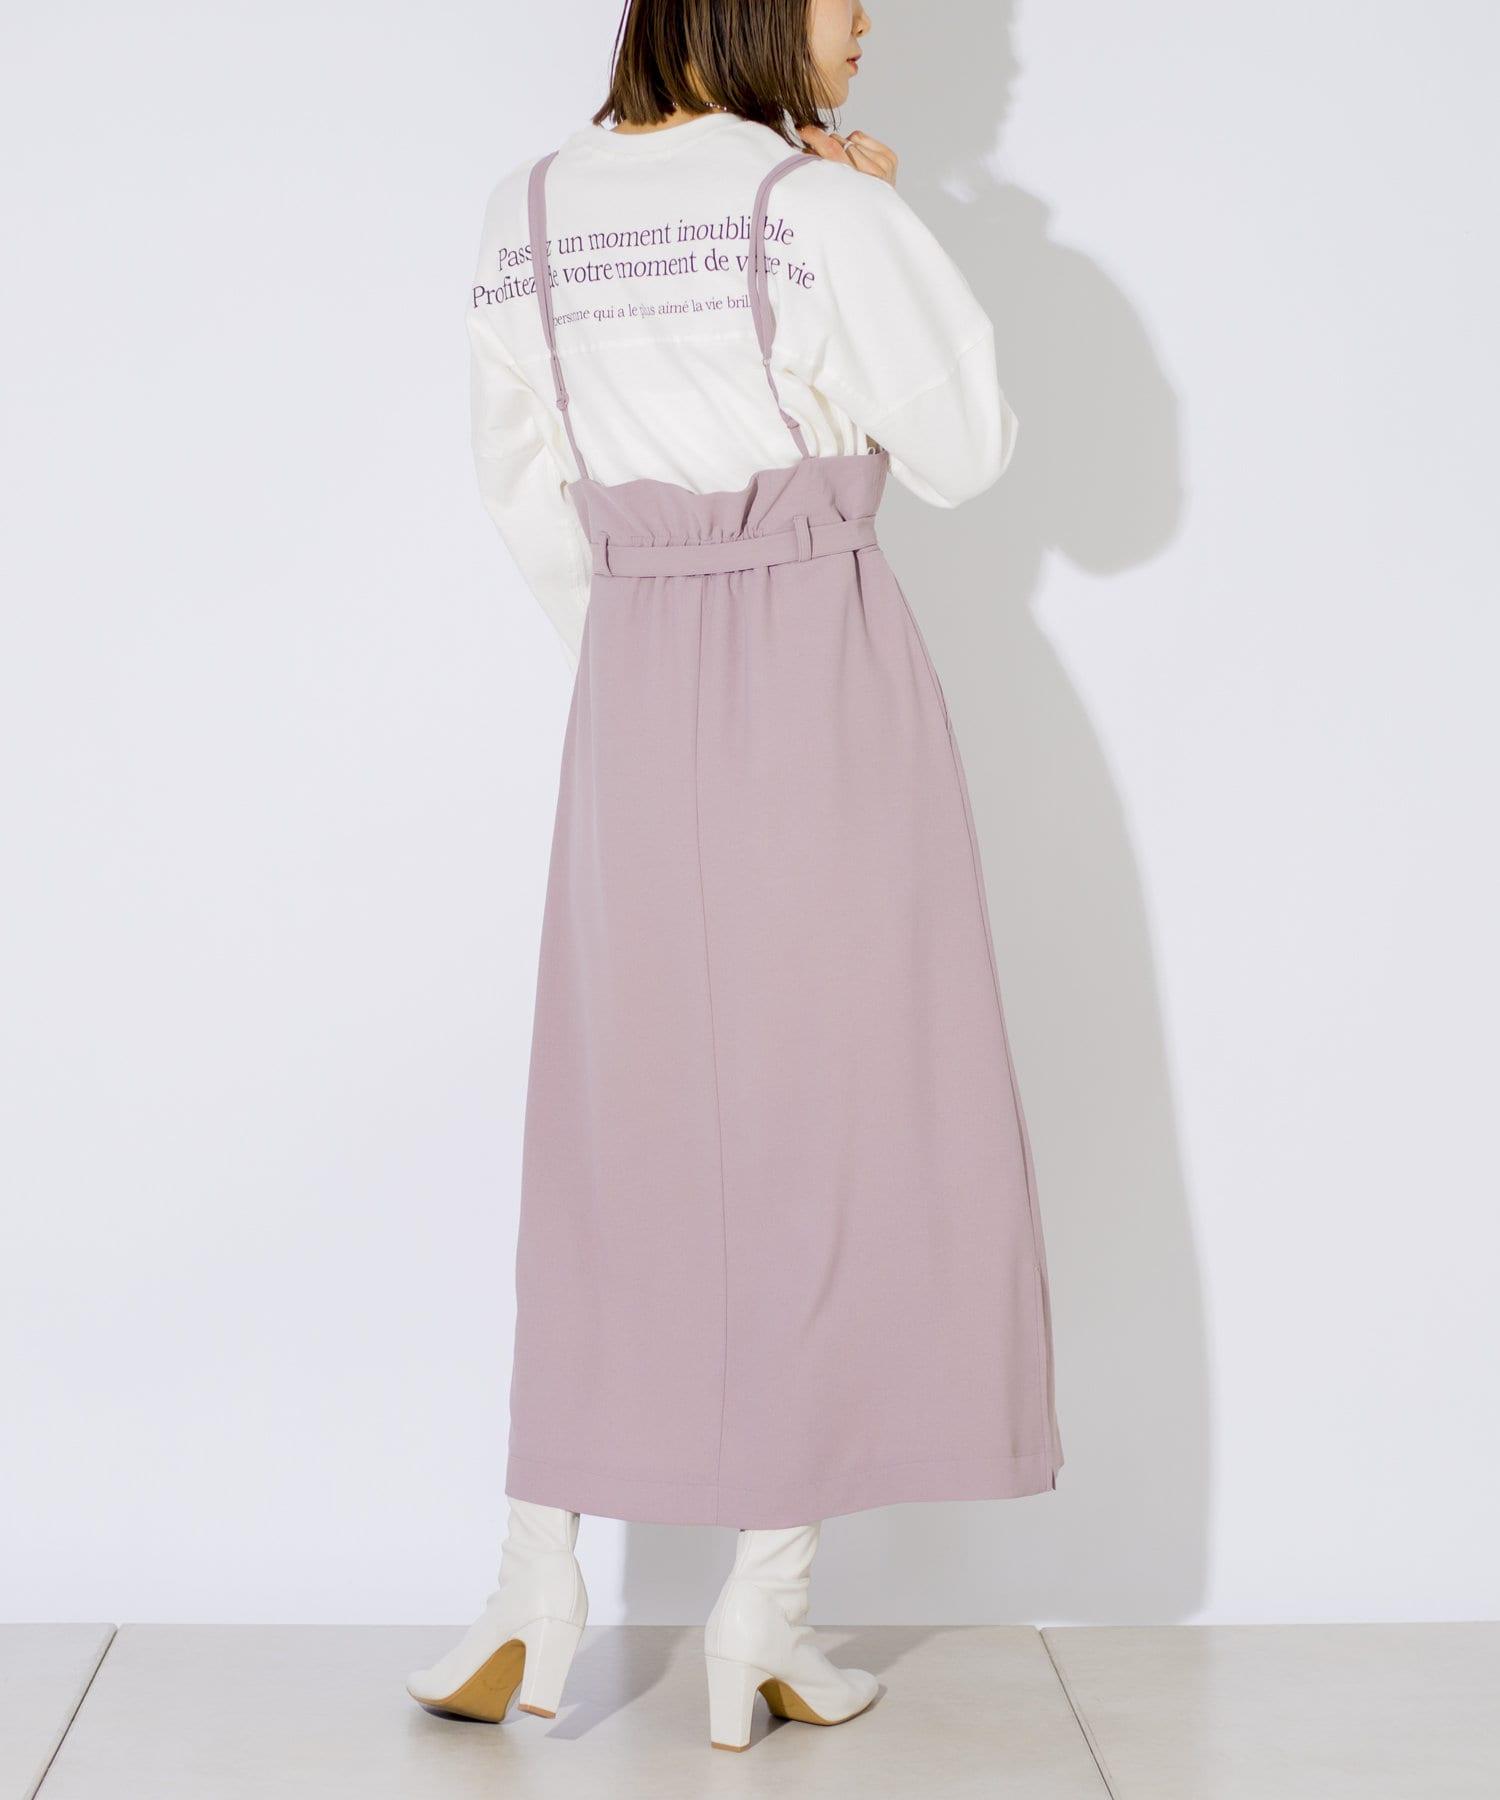 prose verse(プロズヴェール) レディース 【肩紐調節可能】フロント釦サス付きナロースカート ピンク